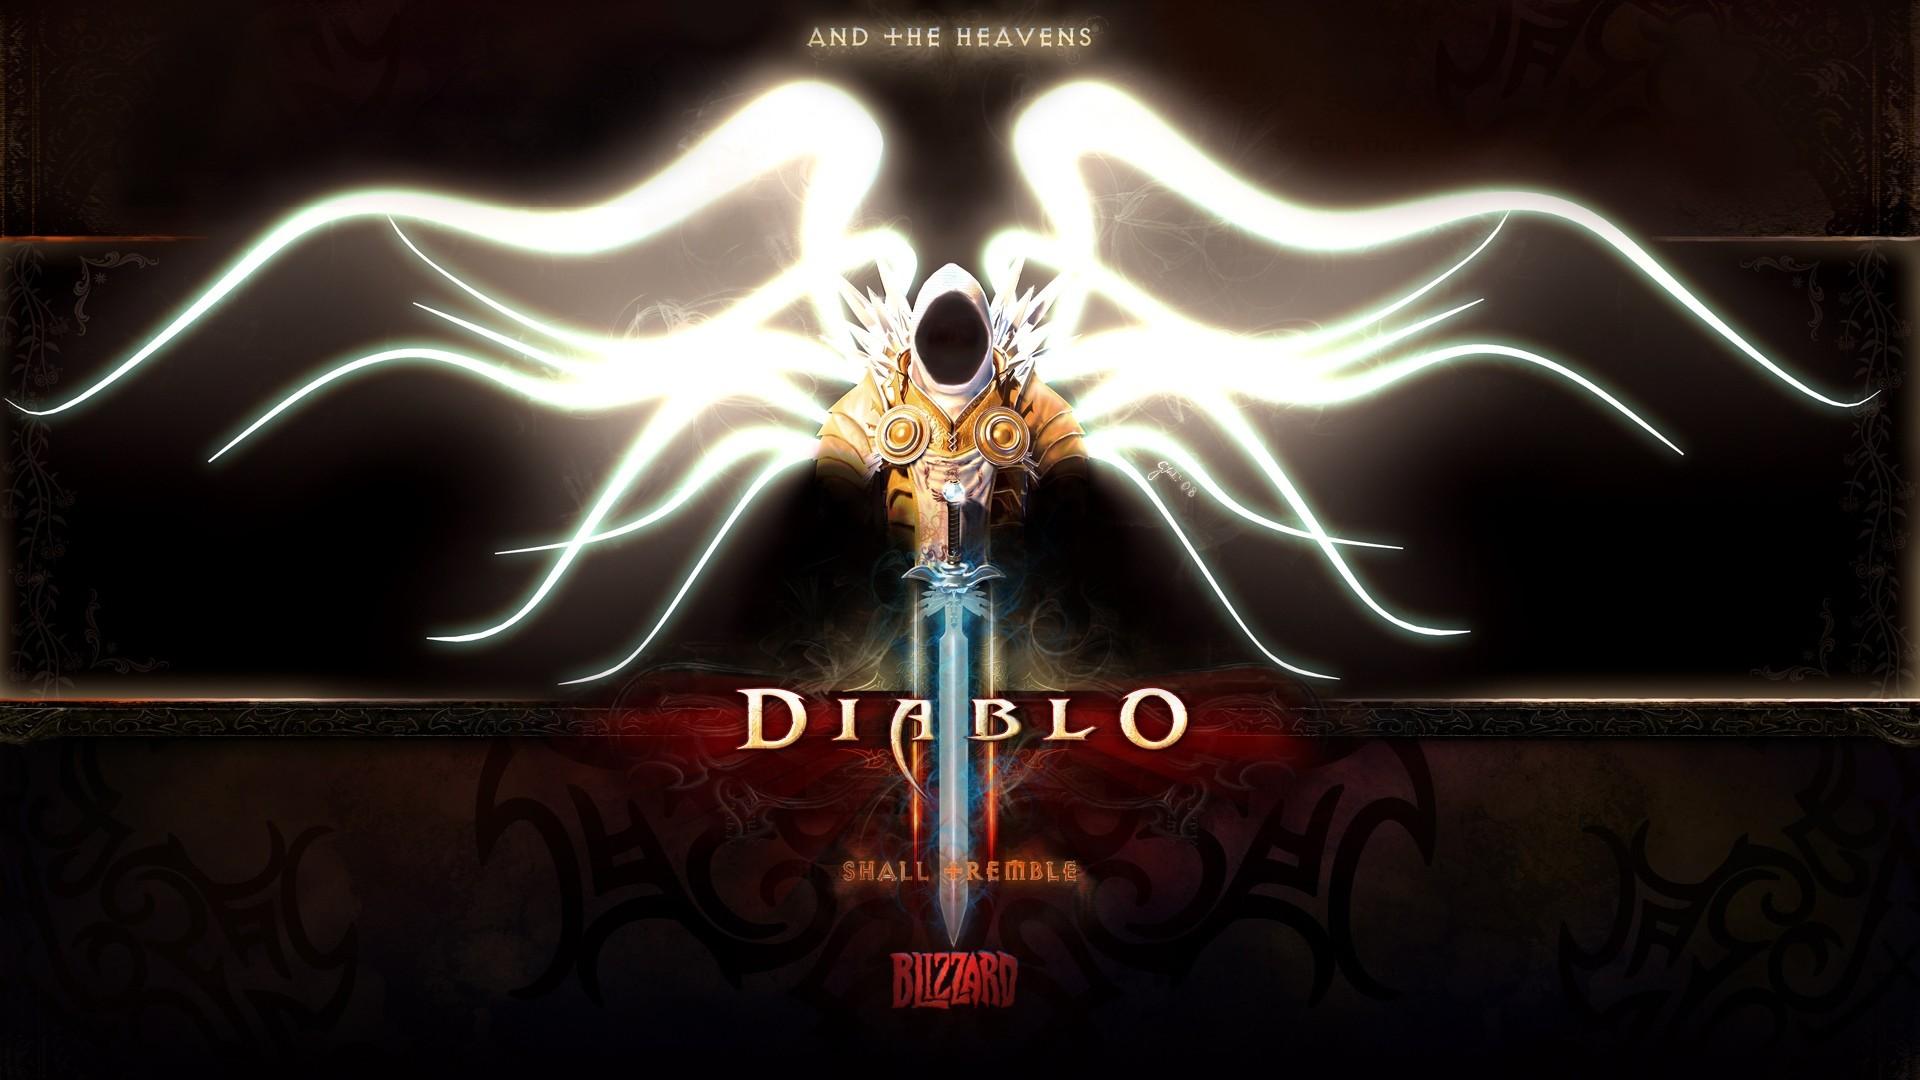 Download Diablo 3 Tyrael Angel Archangel Character Wings Hood Sword Wallpaper Â« Kuff Games 1920x1080